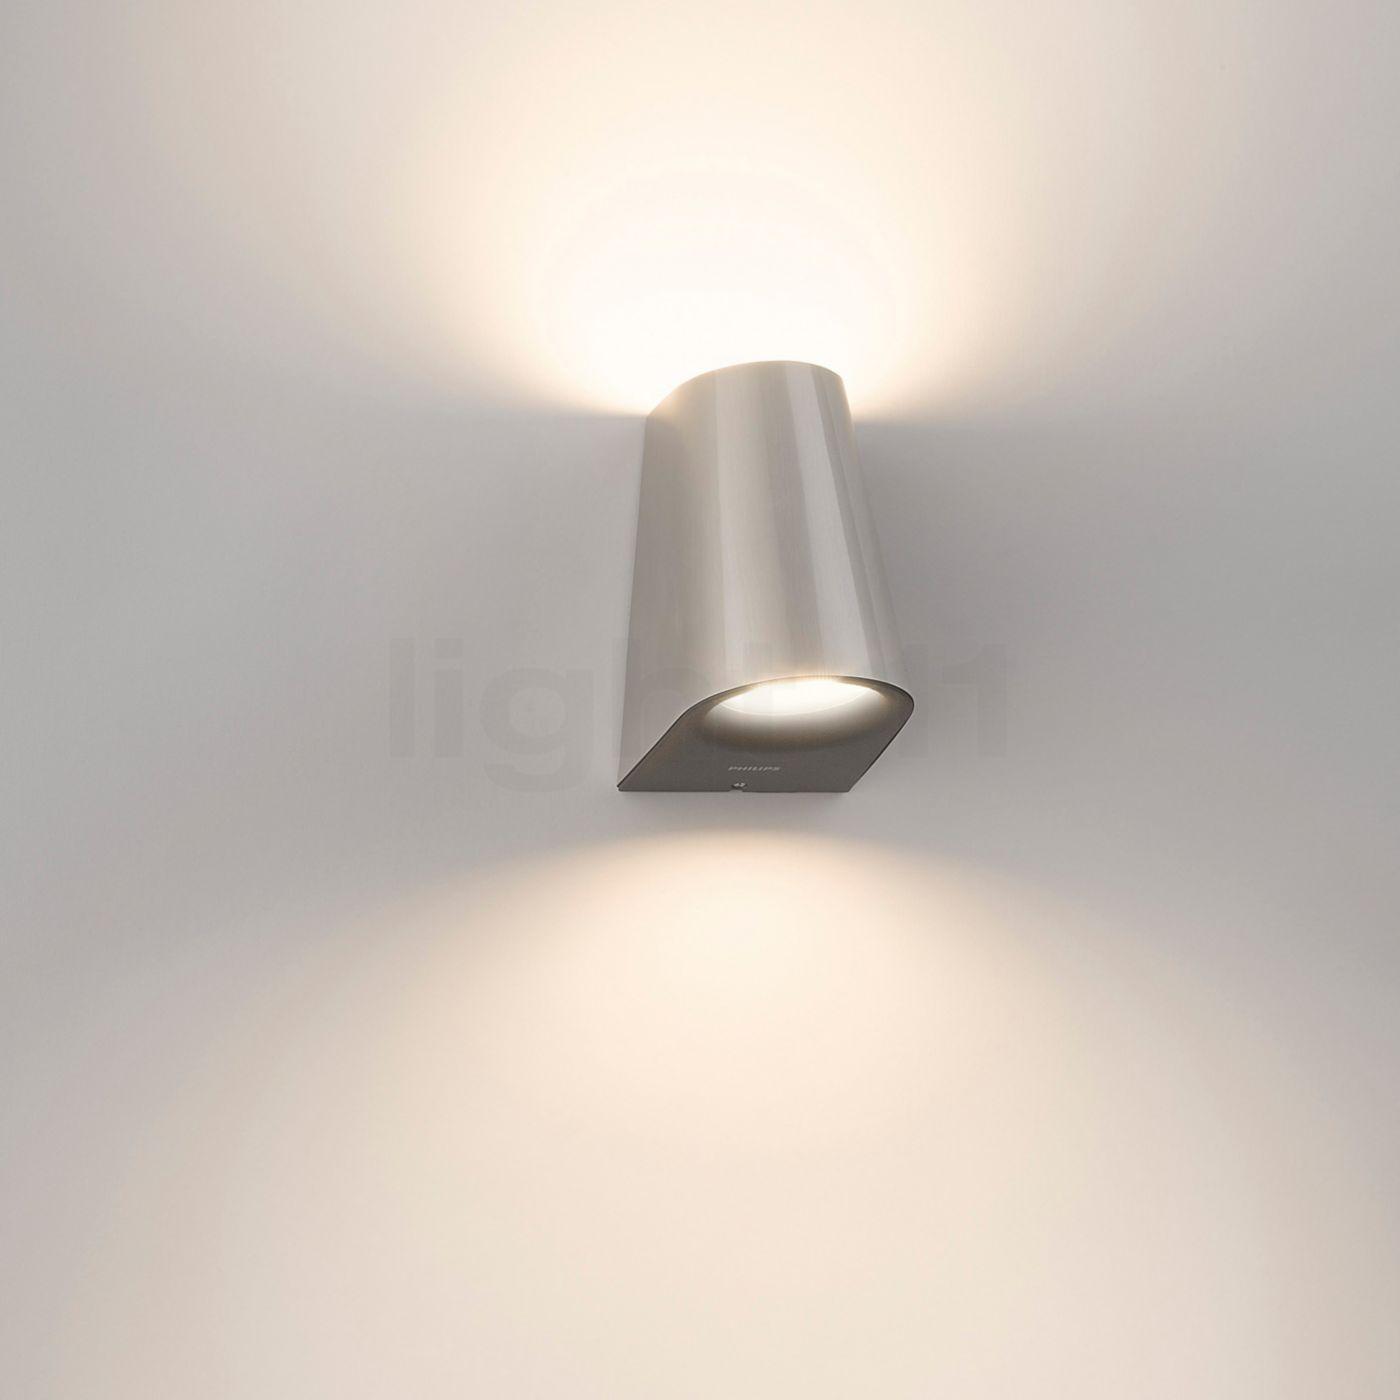 Philips_myGarden_Virga_17288_Wall_light_Up_Down_LED--3002223500005_6_u Faszinierend Up Down Lampe Dekorationen